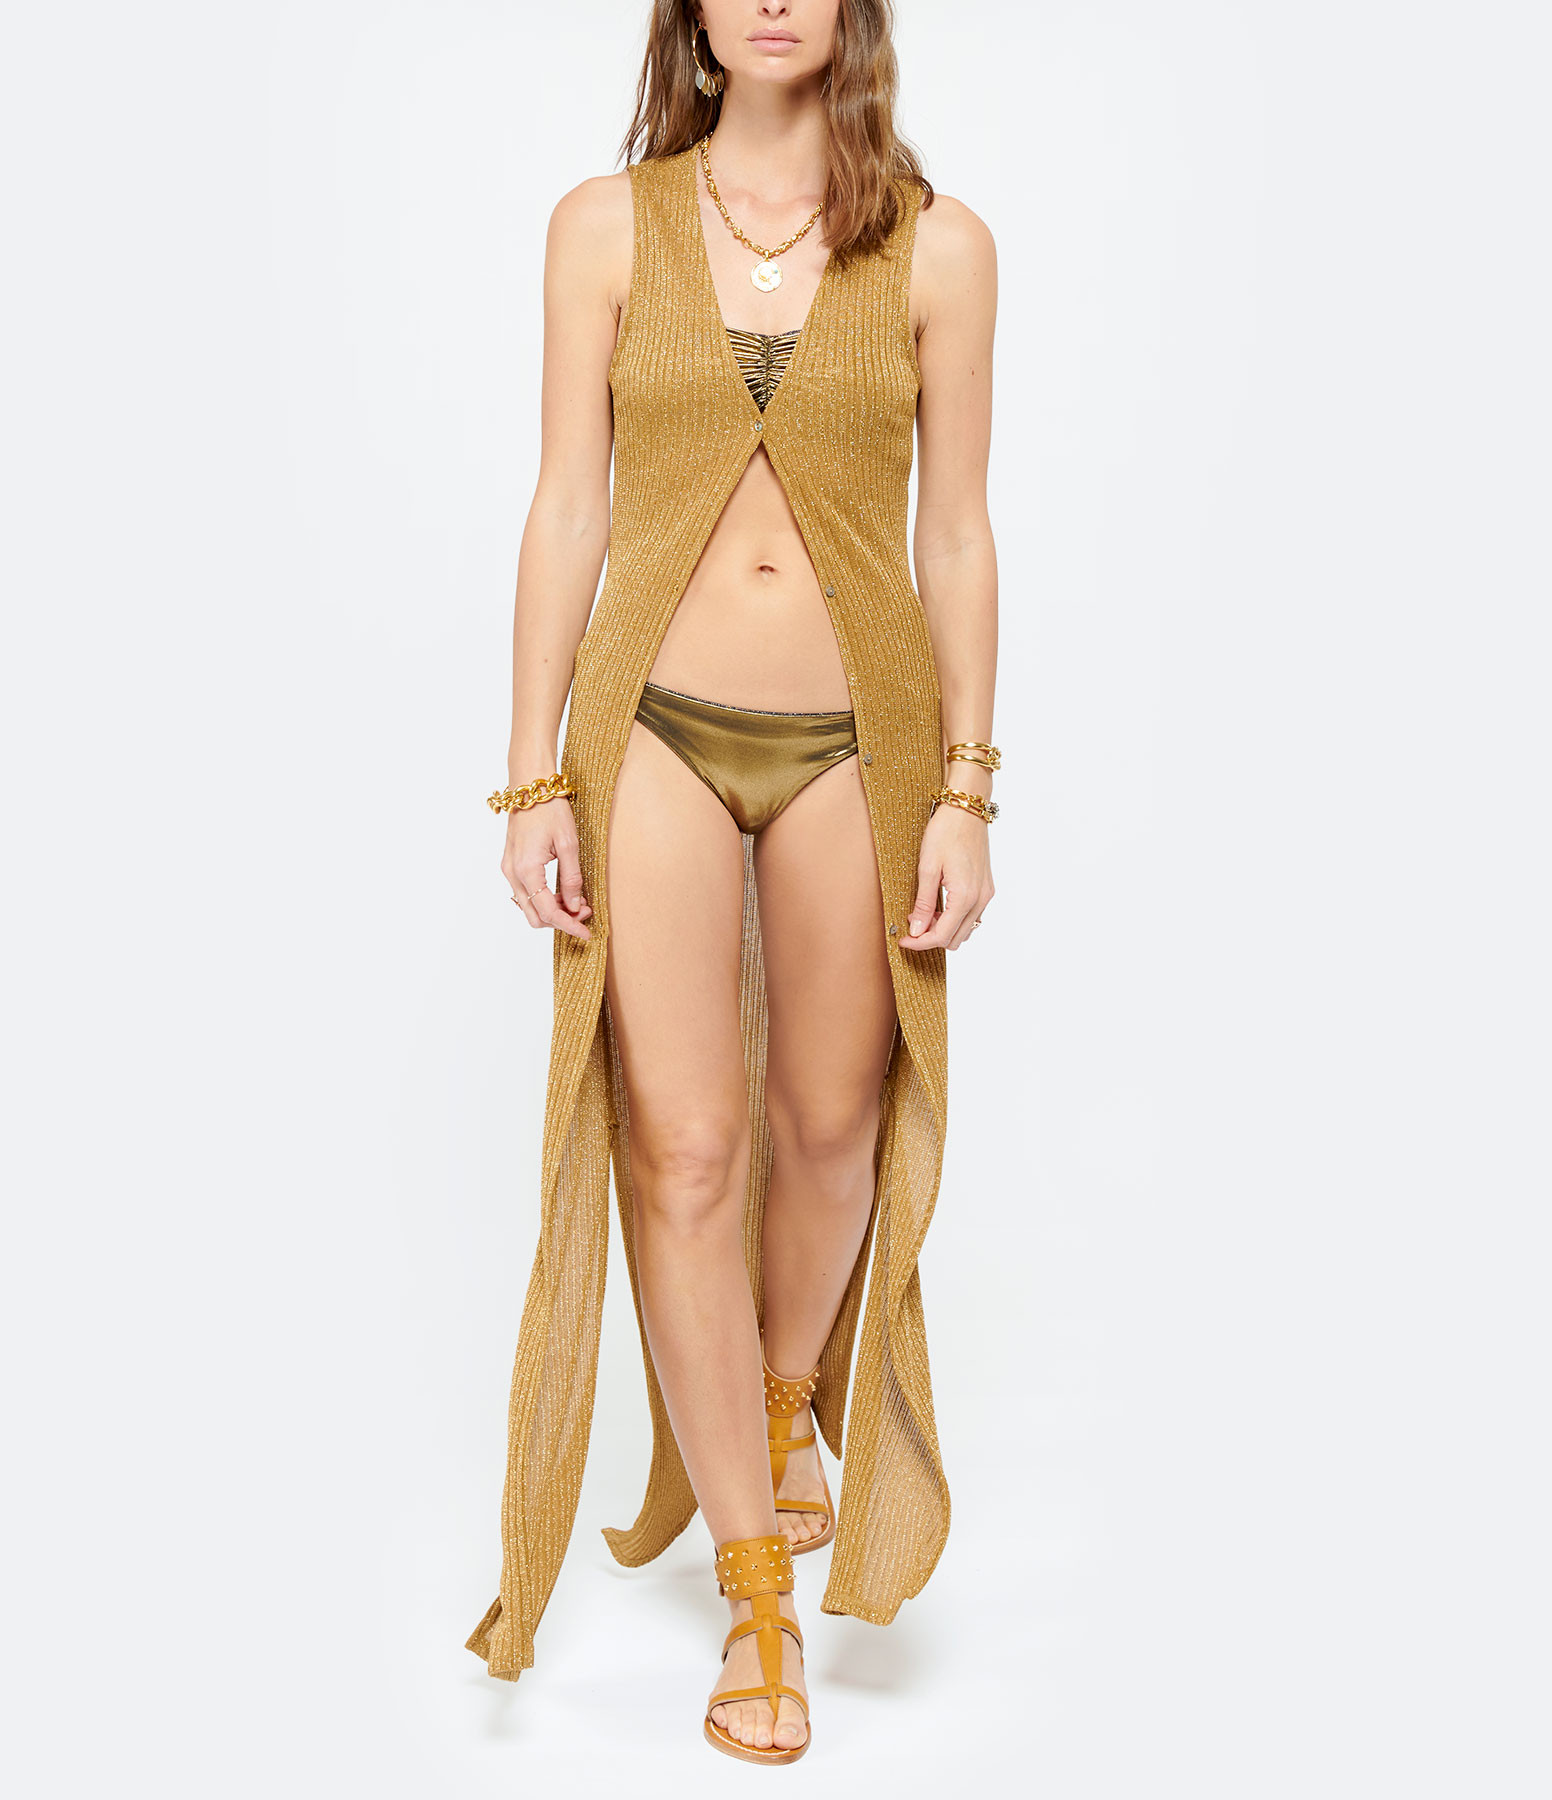 BELIZA - Culotte de Bain Julie Réversible Lurex Navy Tin